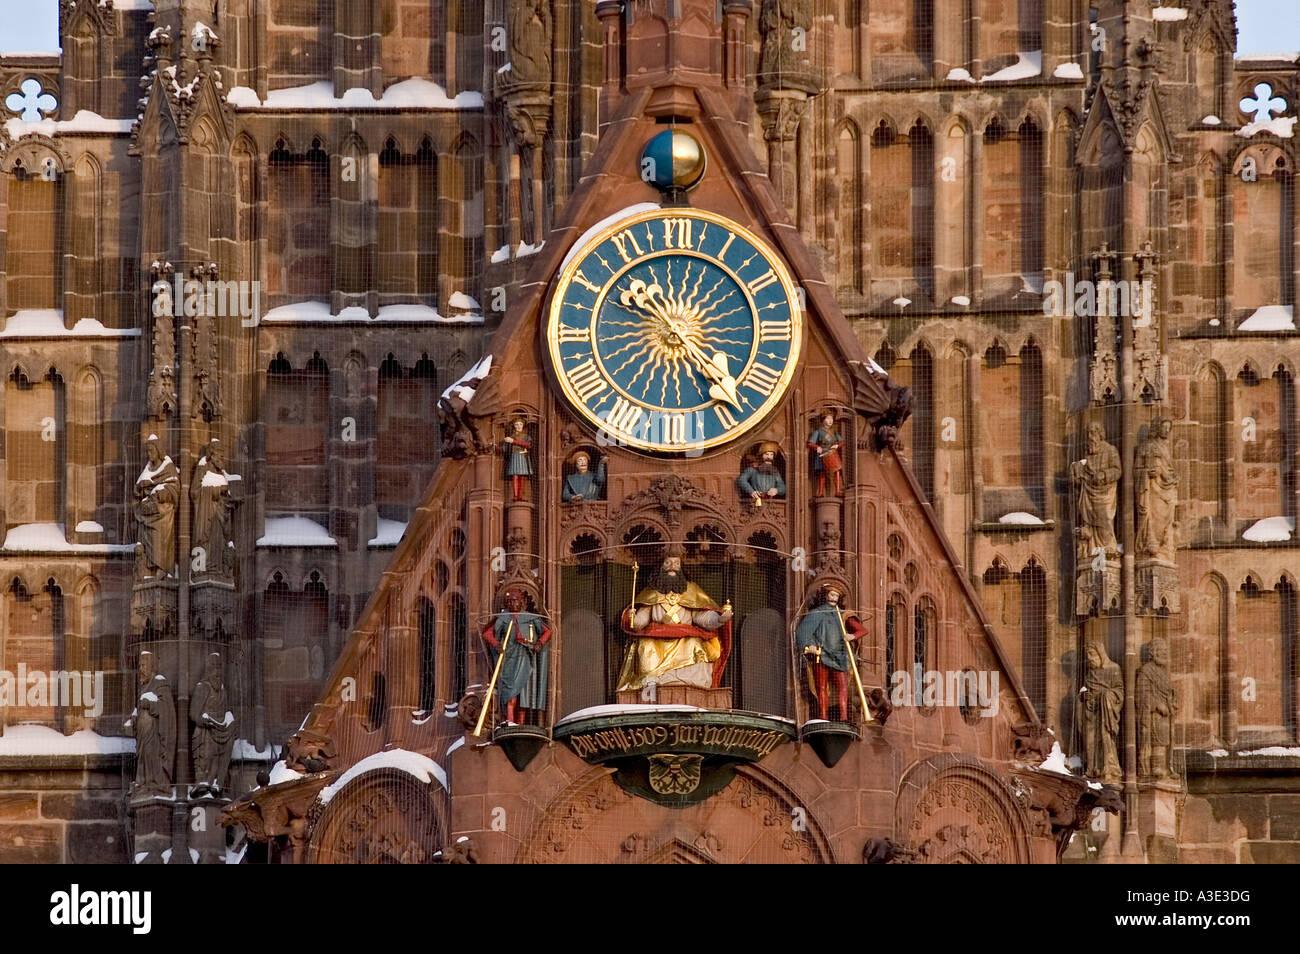 The clock with the 'Maennleinlaufen' of St.Mary´s Church, central market Nuremberg, Bavaria, Germany - Stock Image